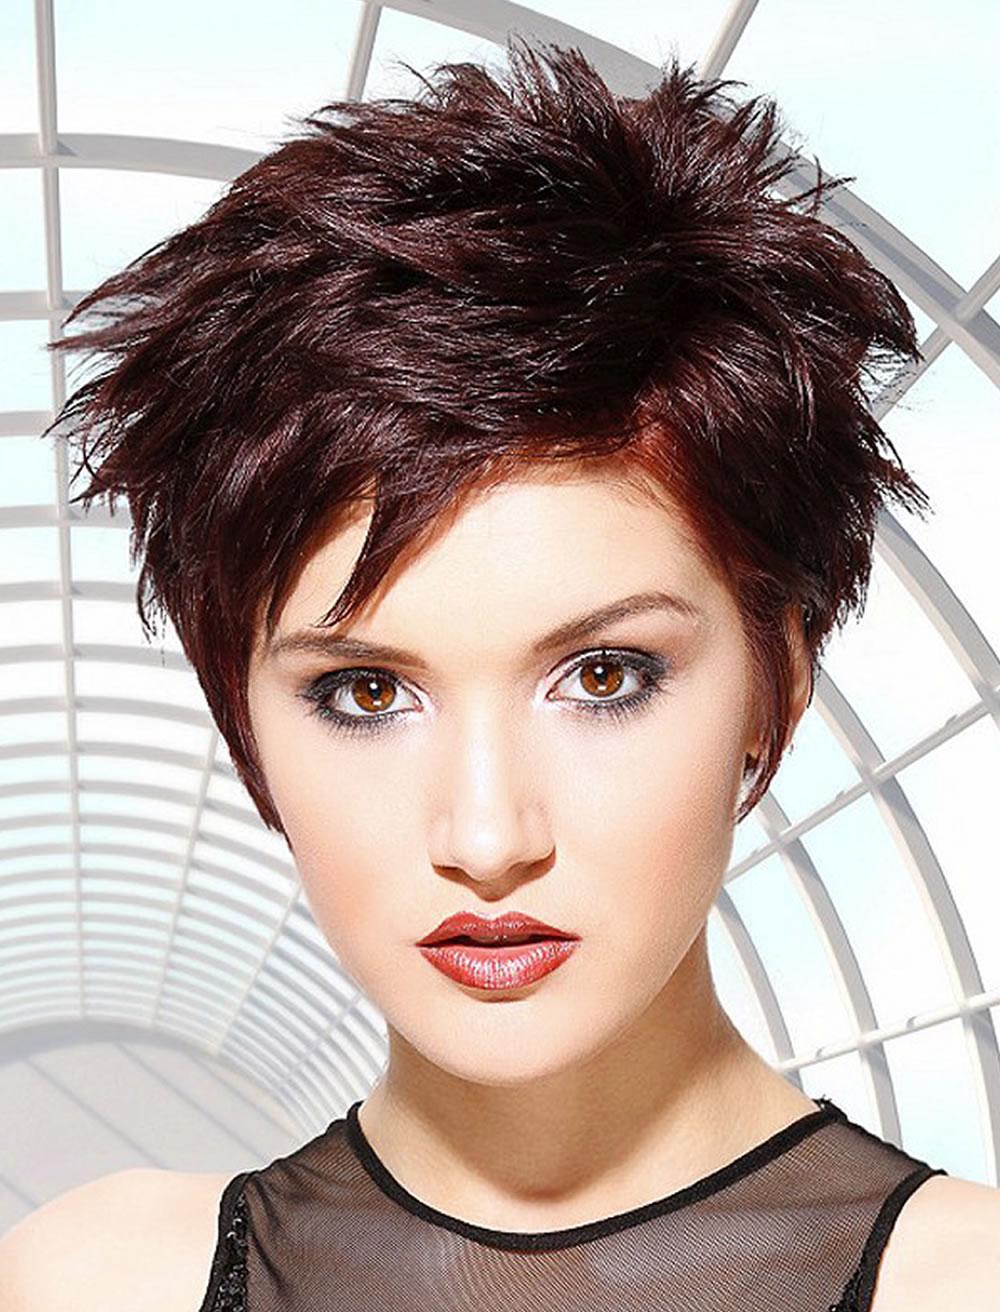 картинки коротких волос прически фото объявлений